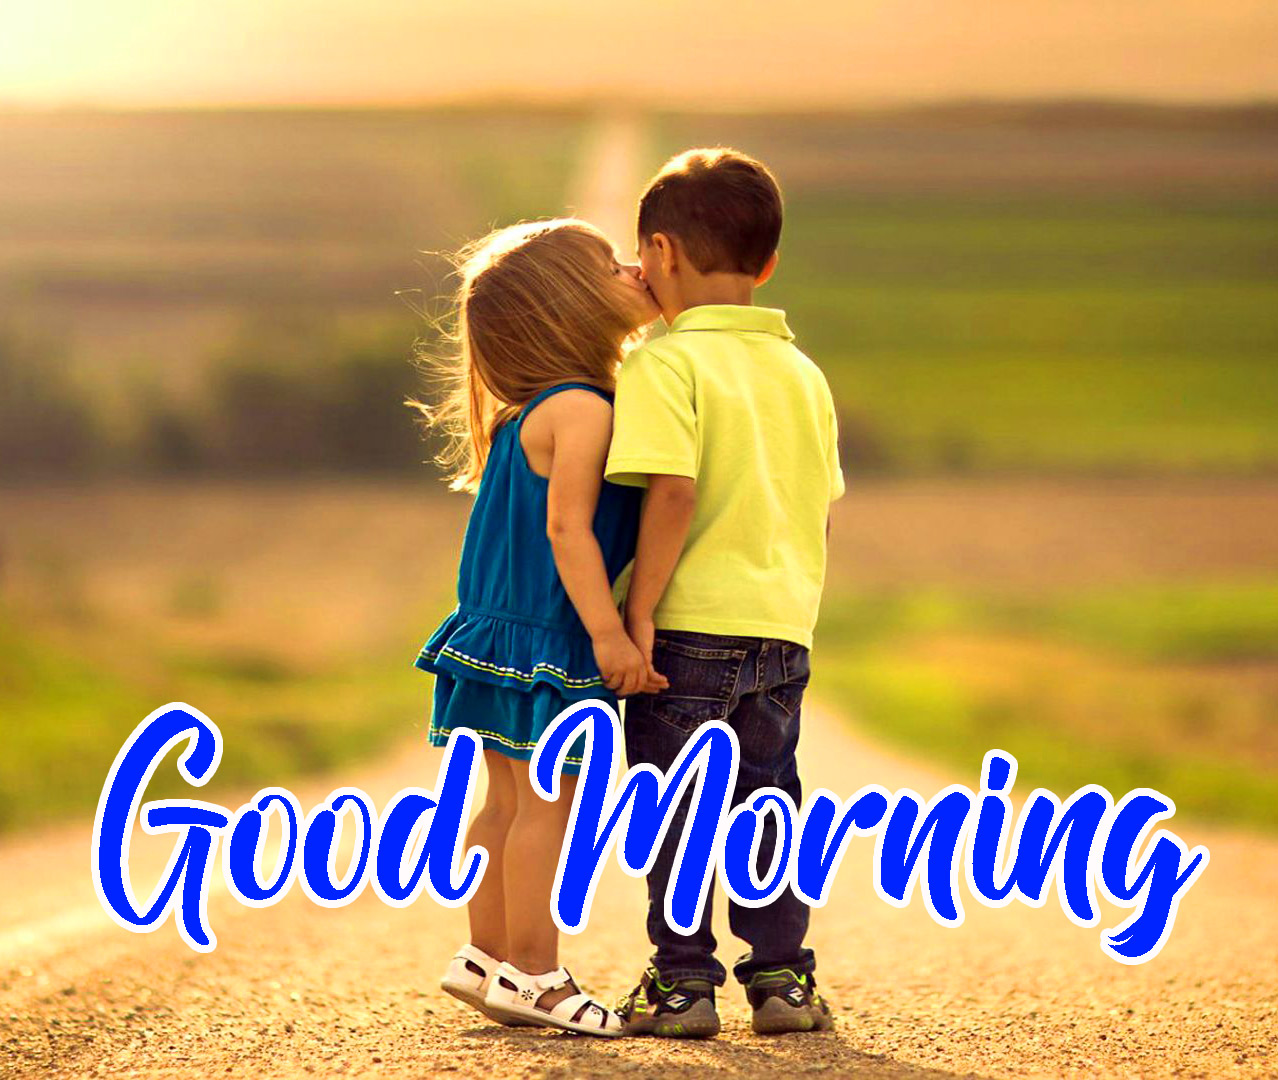 Good Morning Imagesfor Him